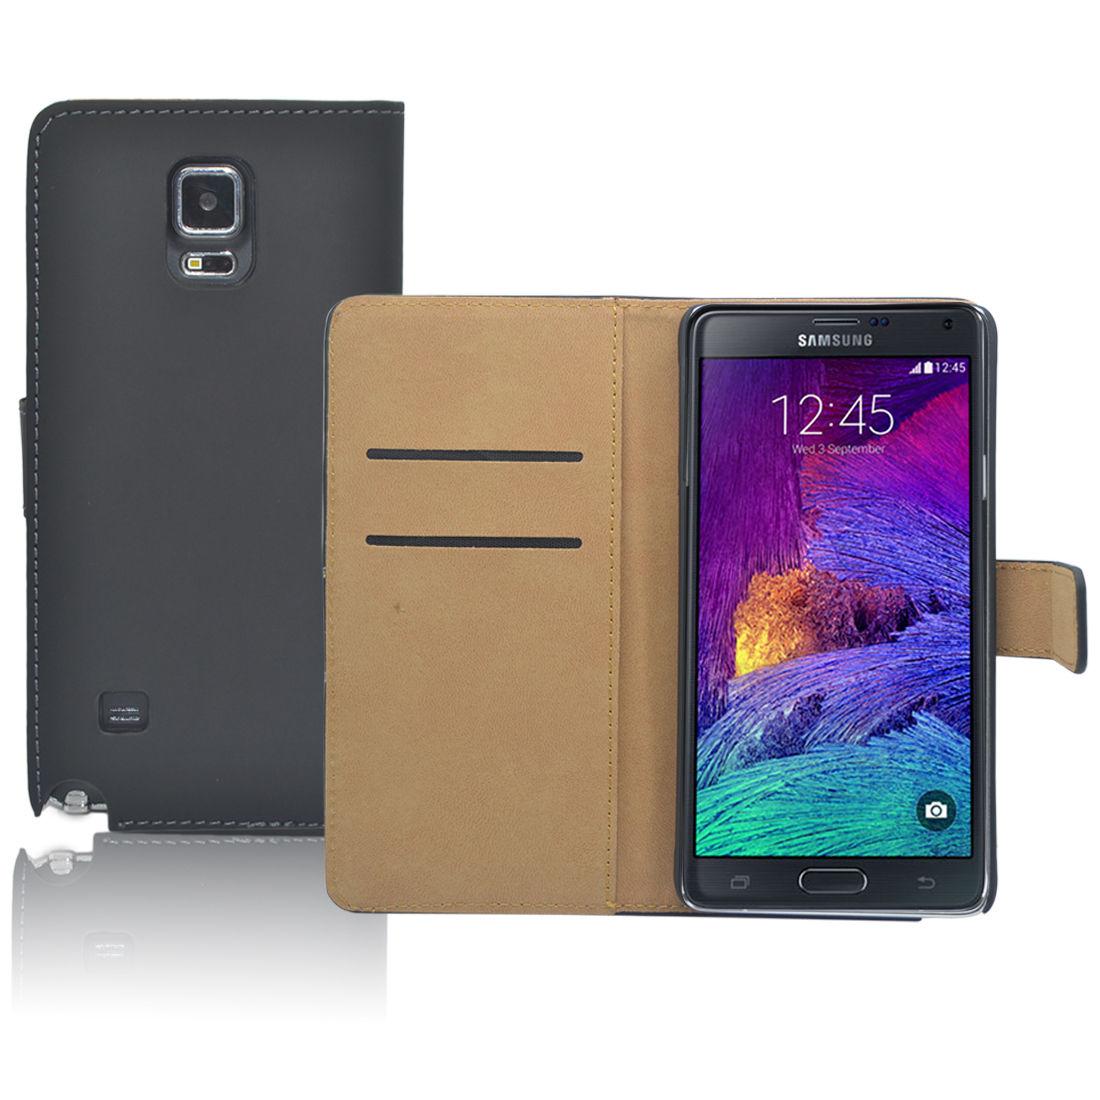 Pouzdro pro Samsung Galaxy Note 4 N910 černé